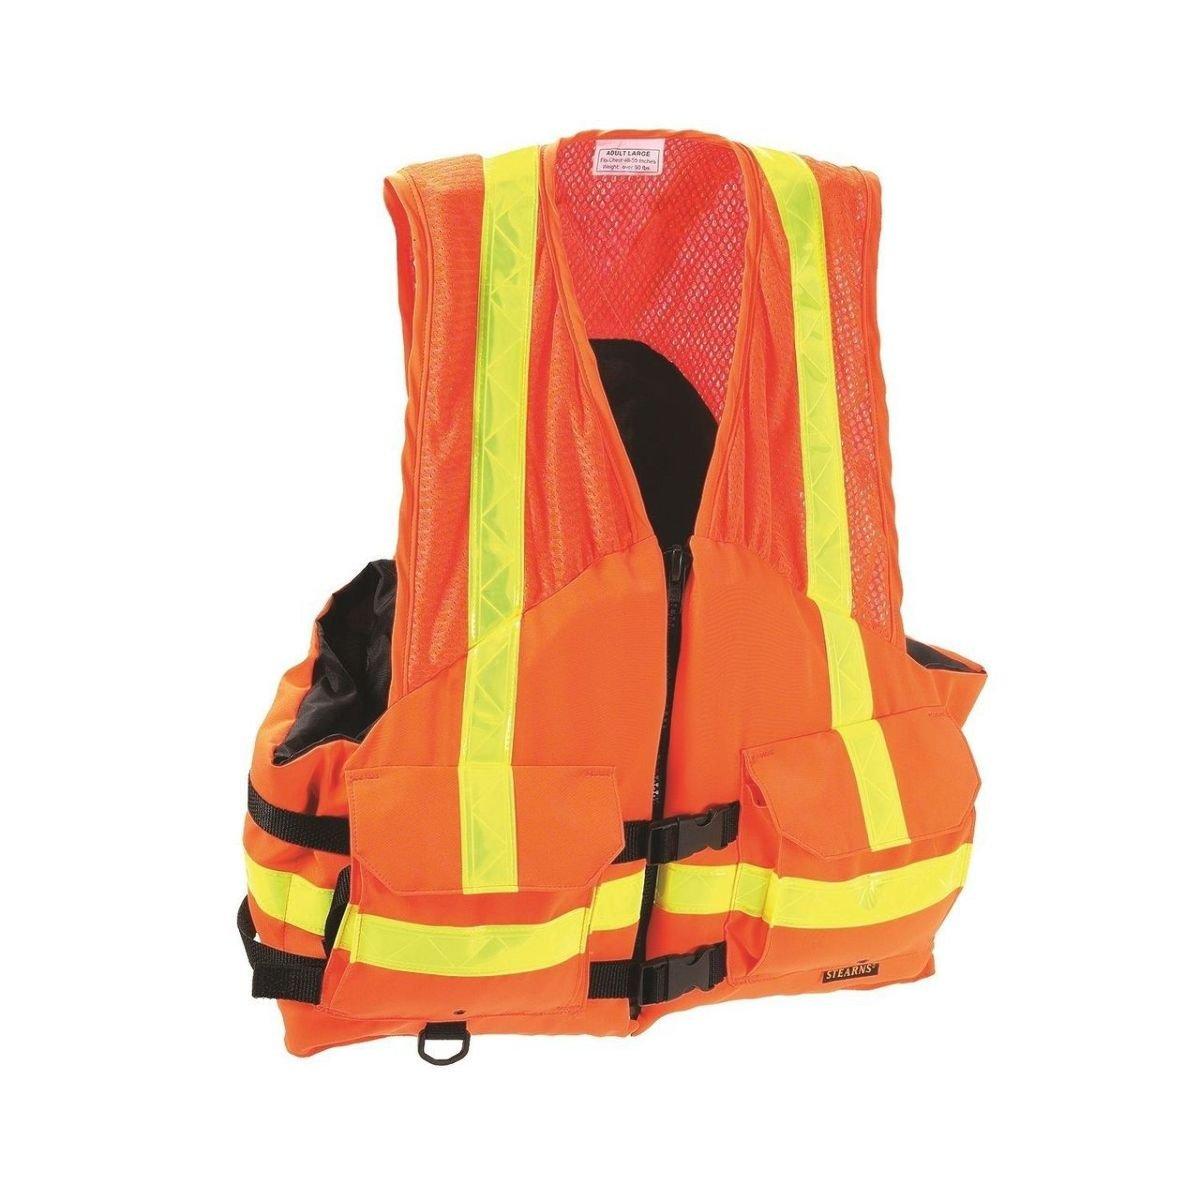 (orange, 2-xtralarge/3-xtralarge) Ergodyne GloWear 2XL/3XL Class-3 Economy Vest in Orange B003E3RPXA